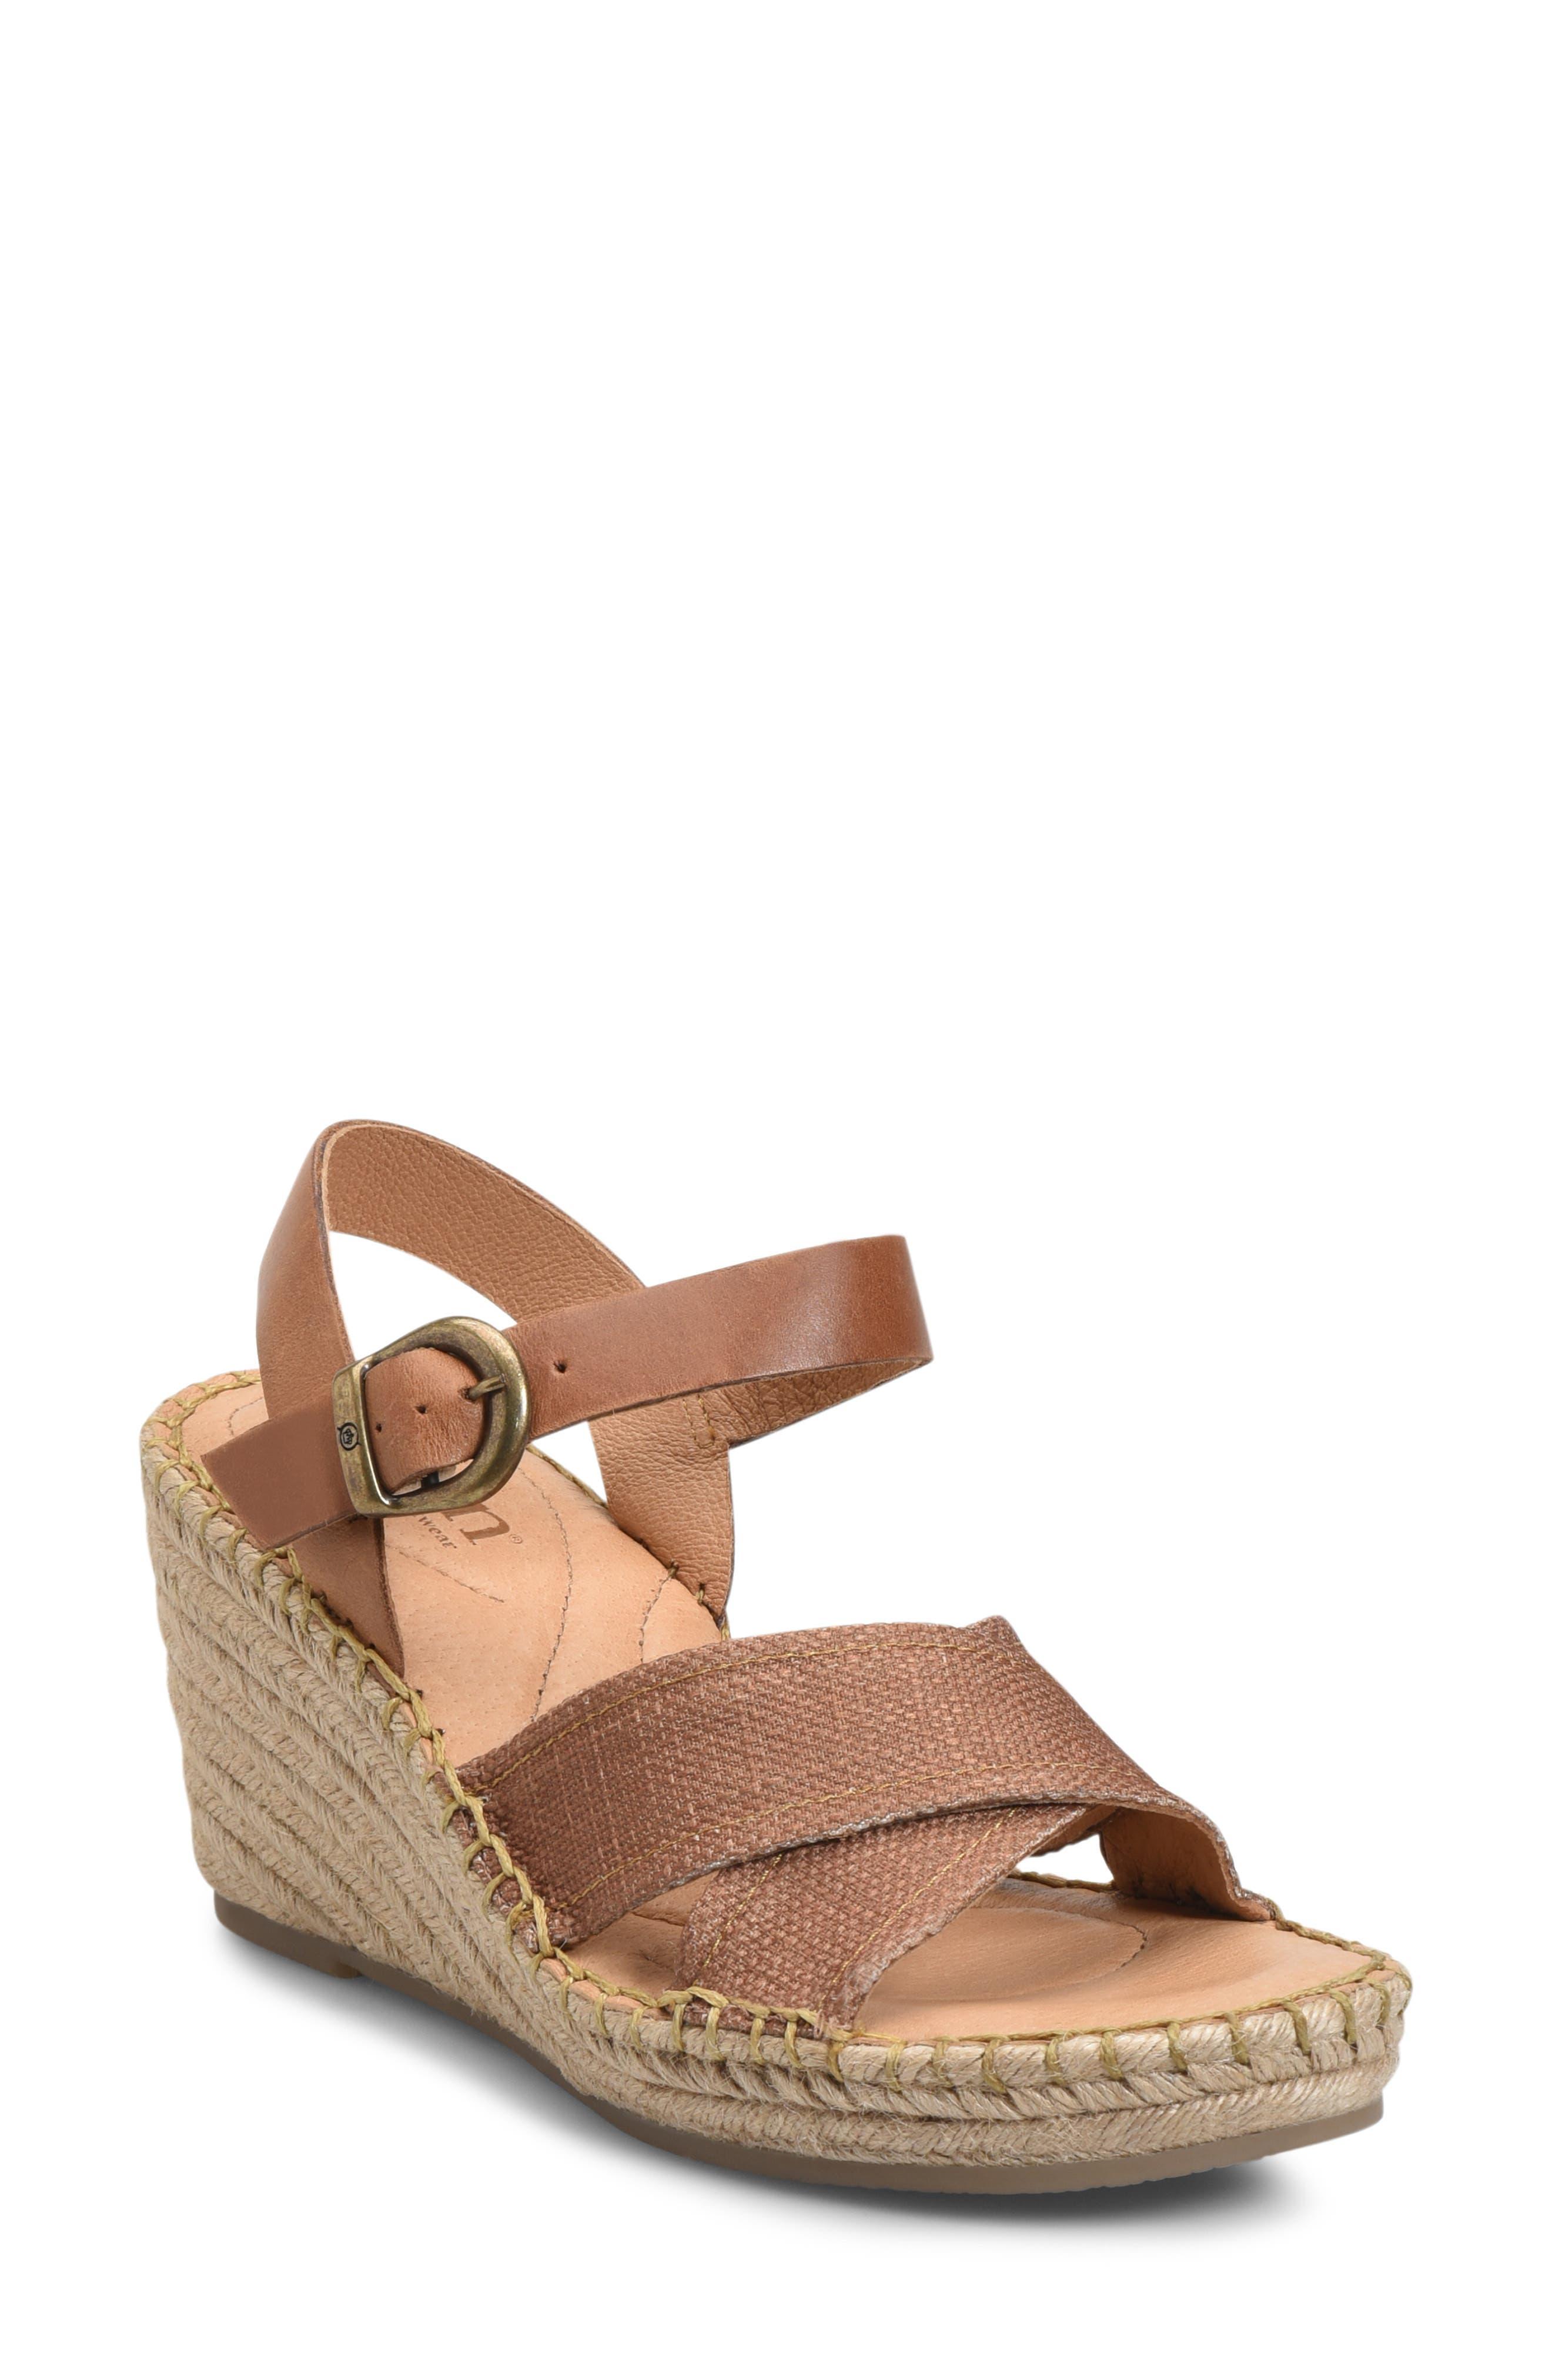 B?rn Payette Wedge Sandal, Brown